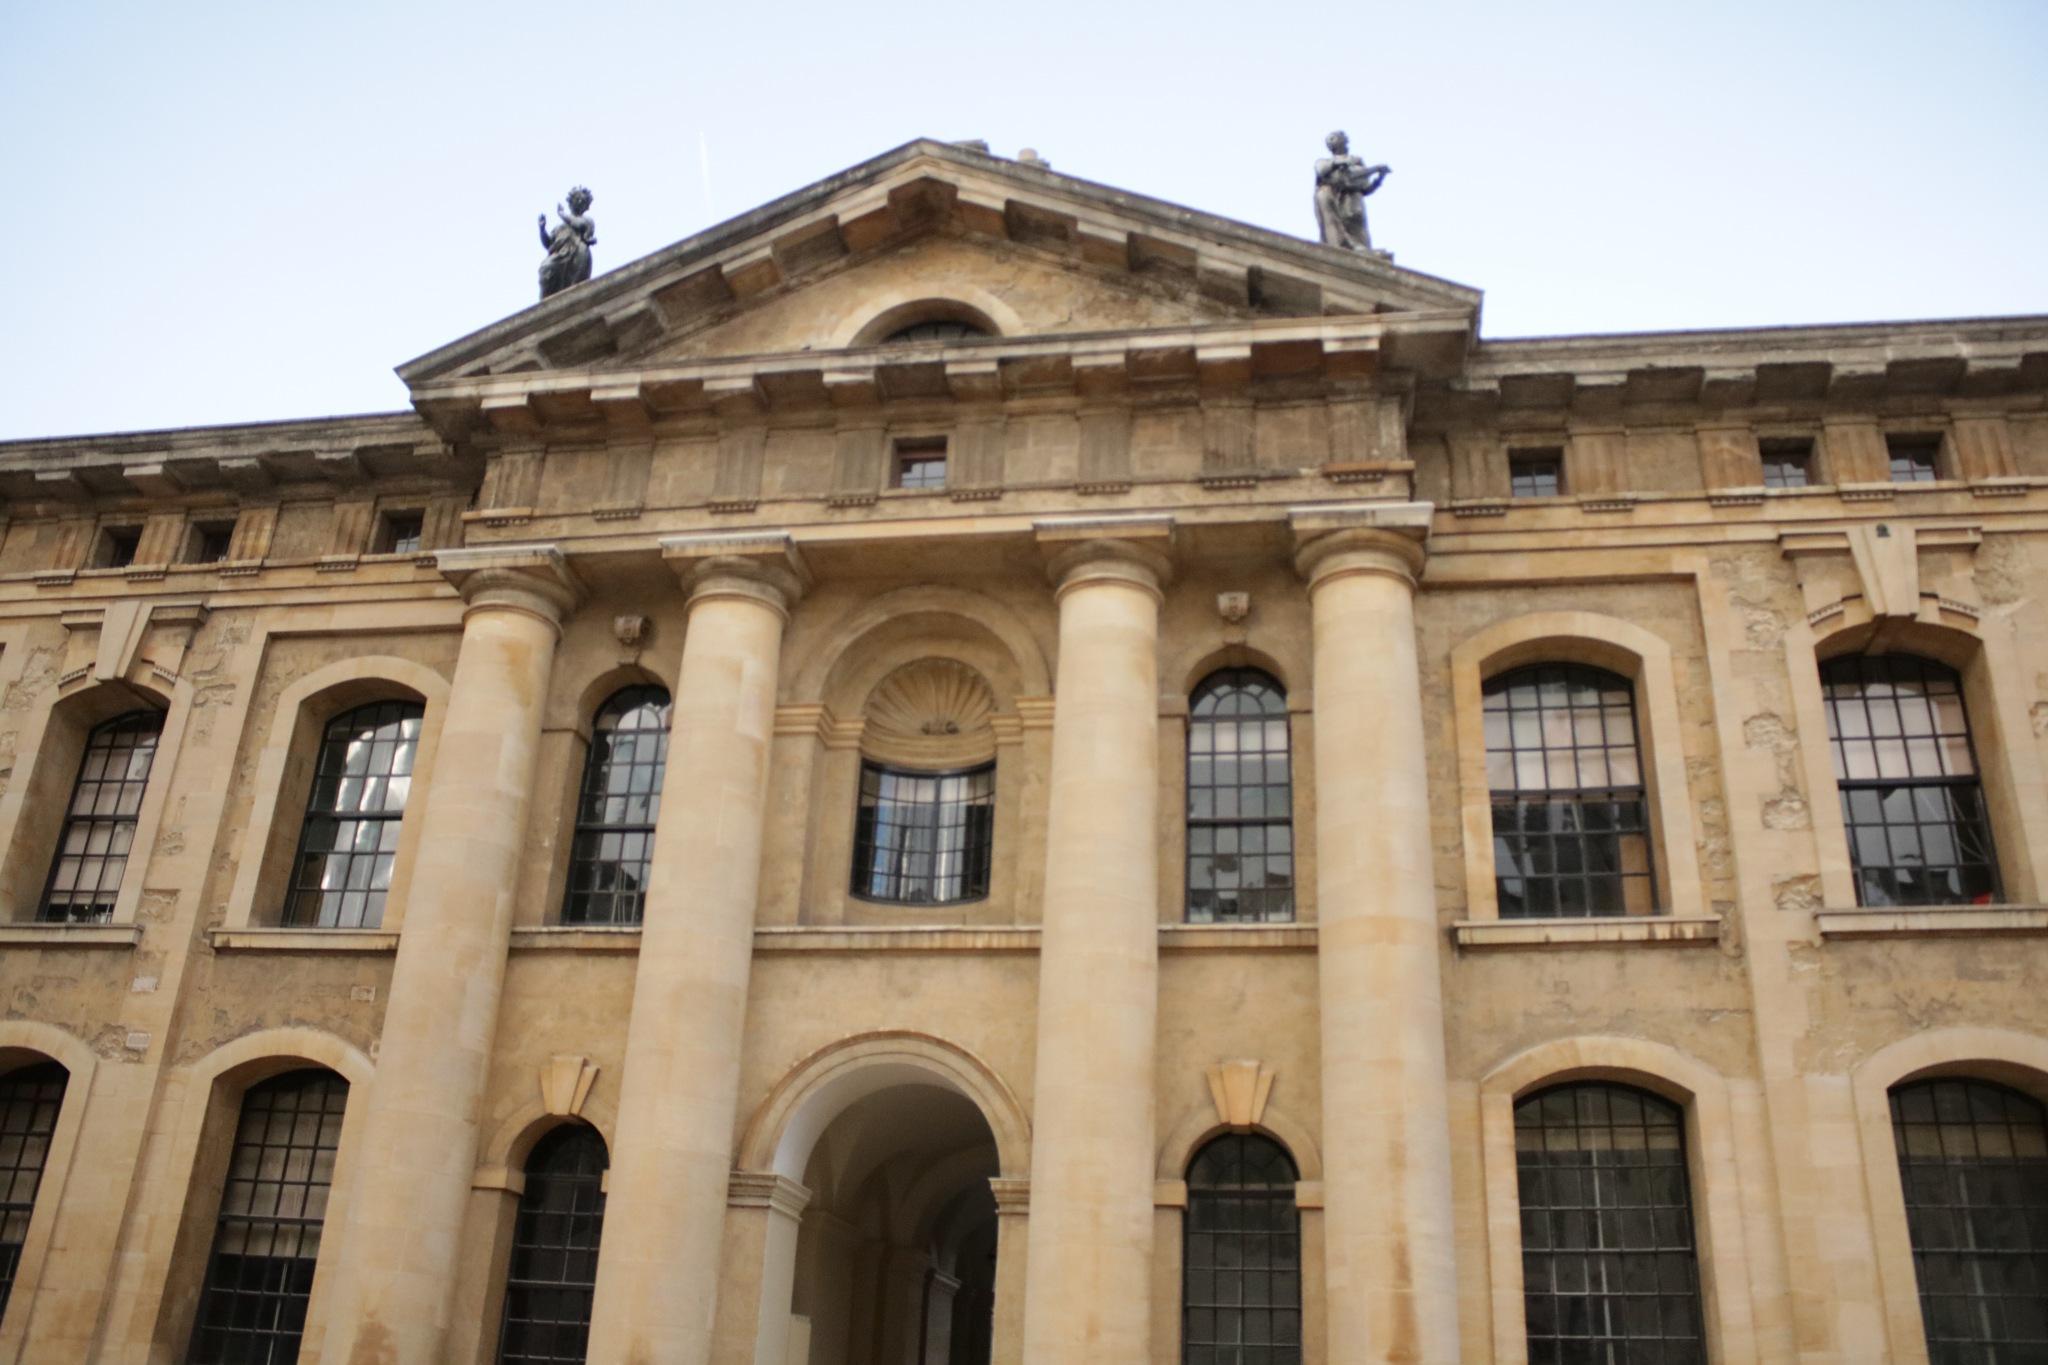 Greek, Italian and British Designs! at Oxford by Mo Dessouki